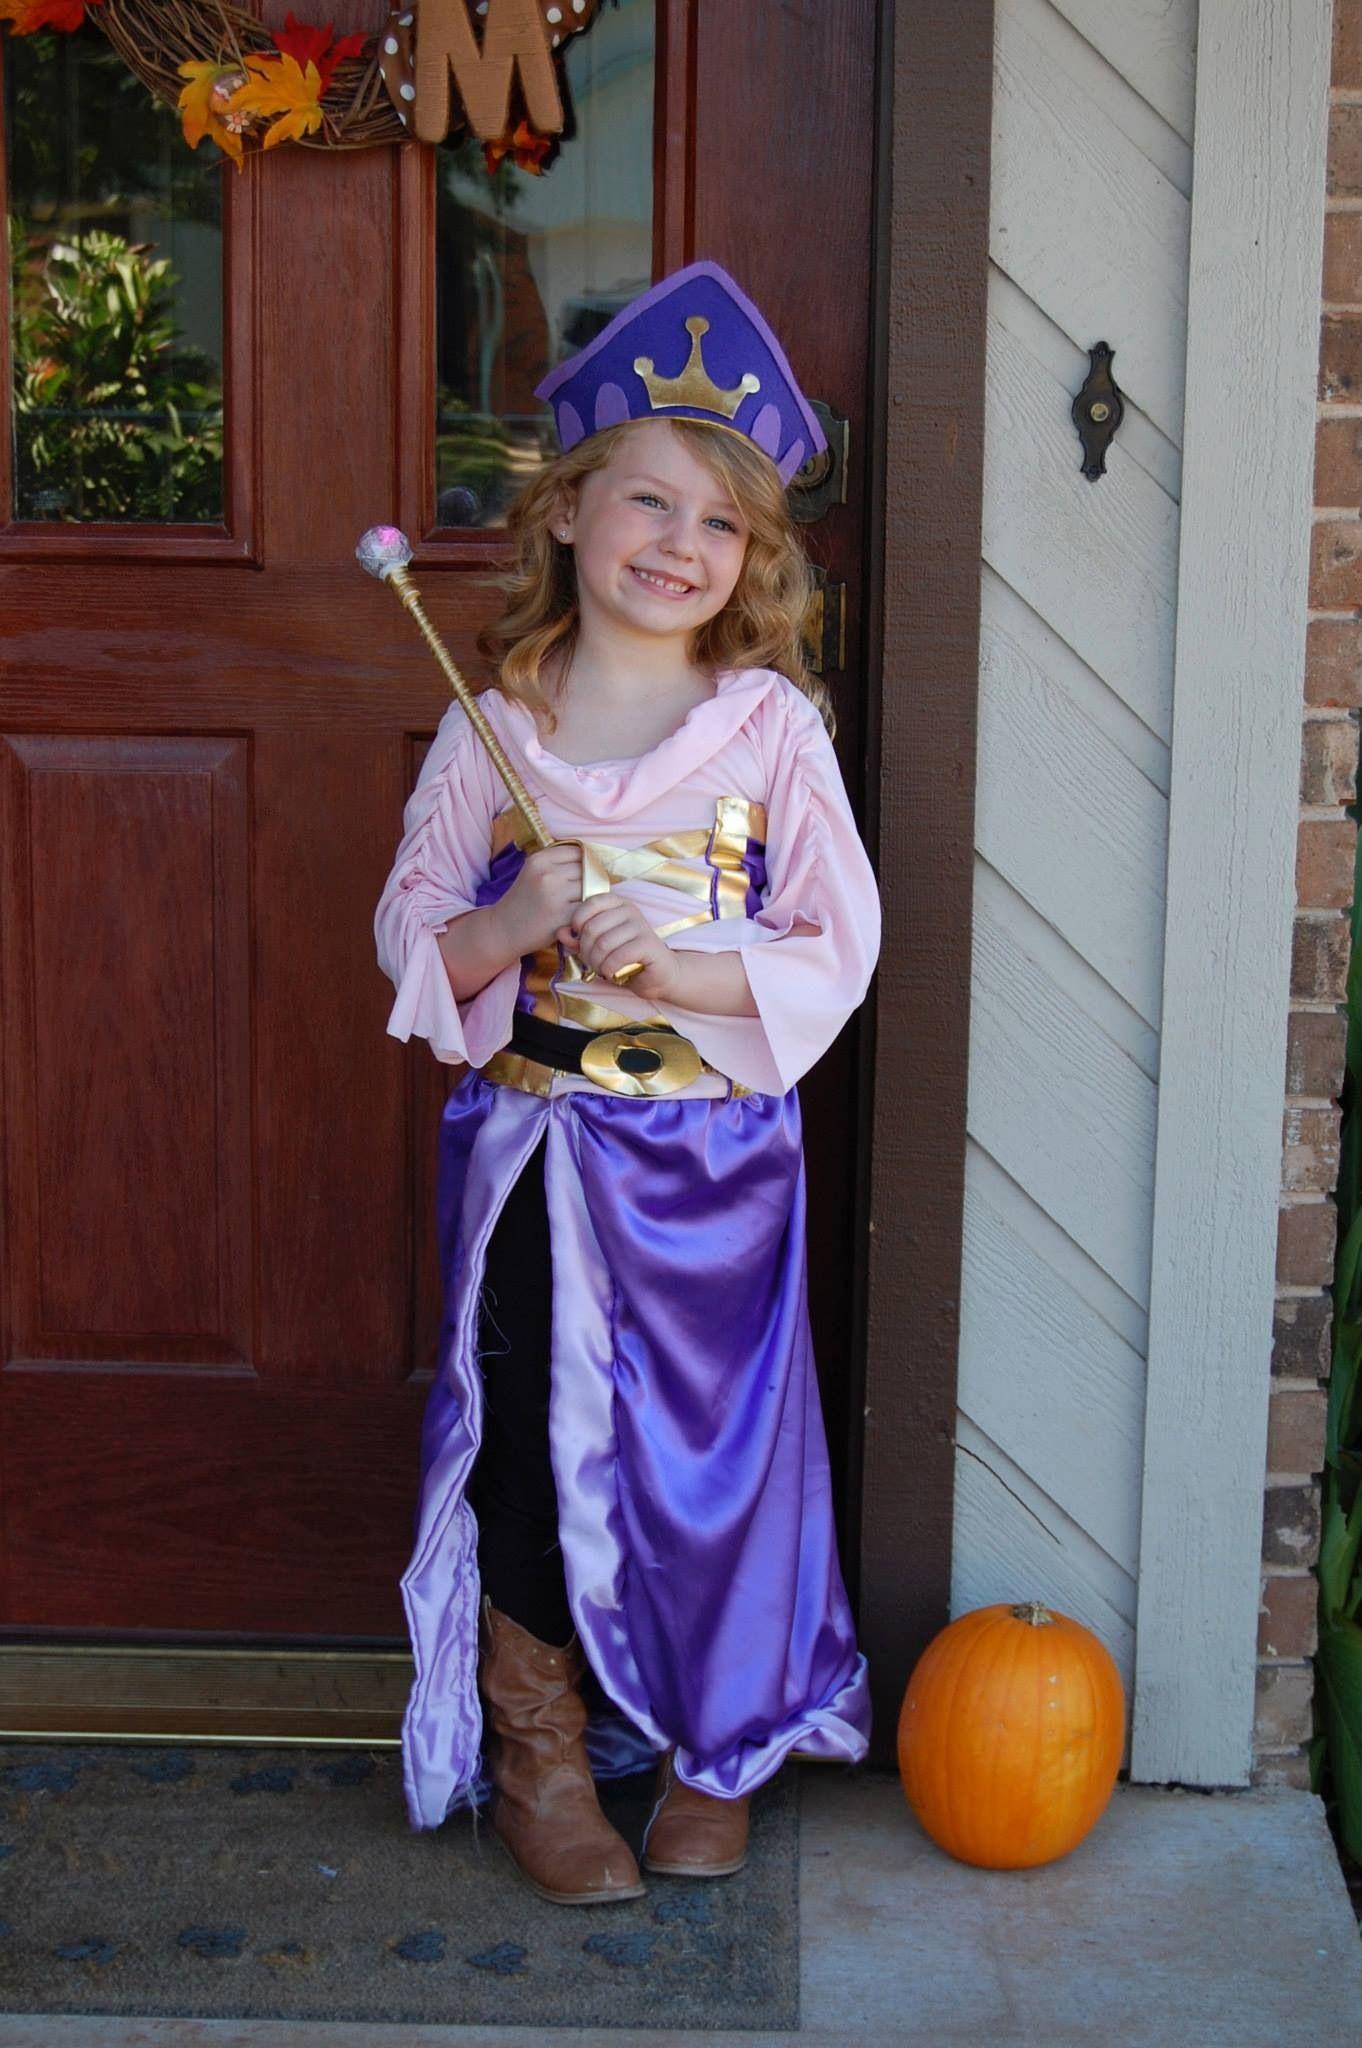 47f8c238771 Disney's Jake and the Neverland Pirates-Pirate Princess costume ...